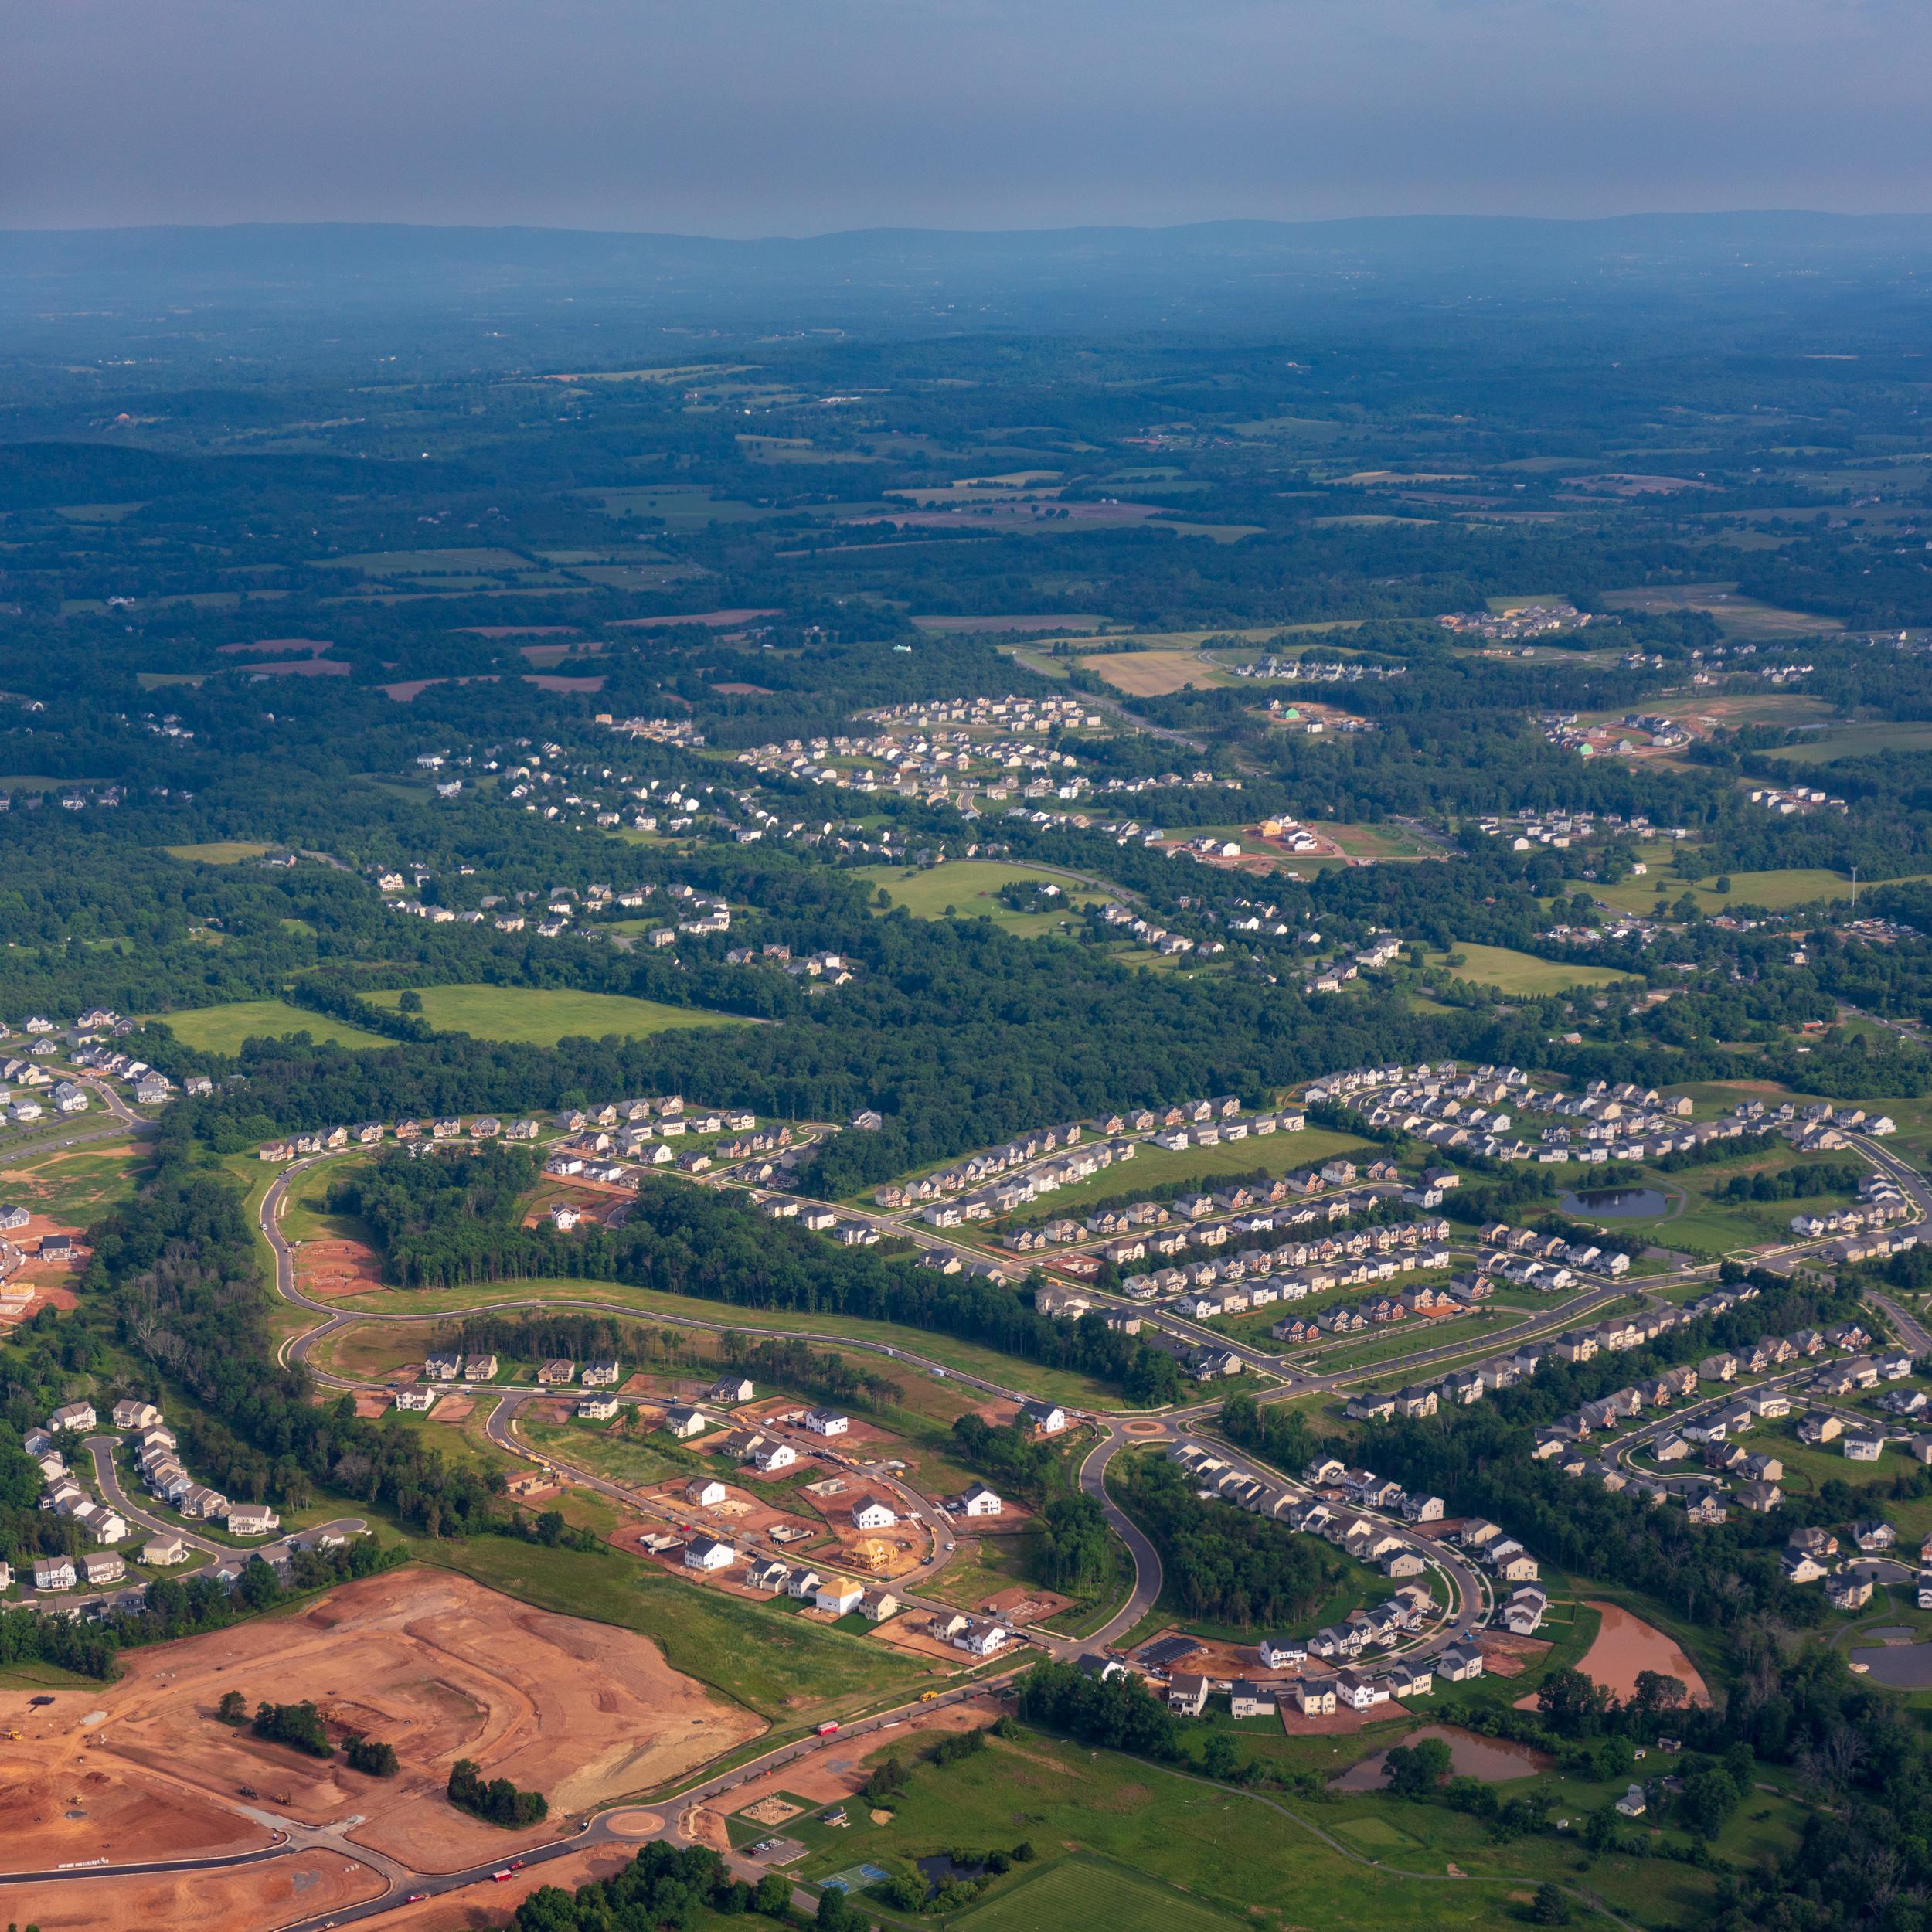 Aerials for Bannon 2019 (2.5k)-13.jpg